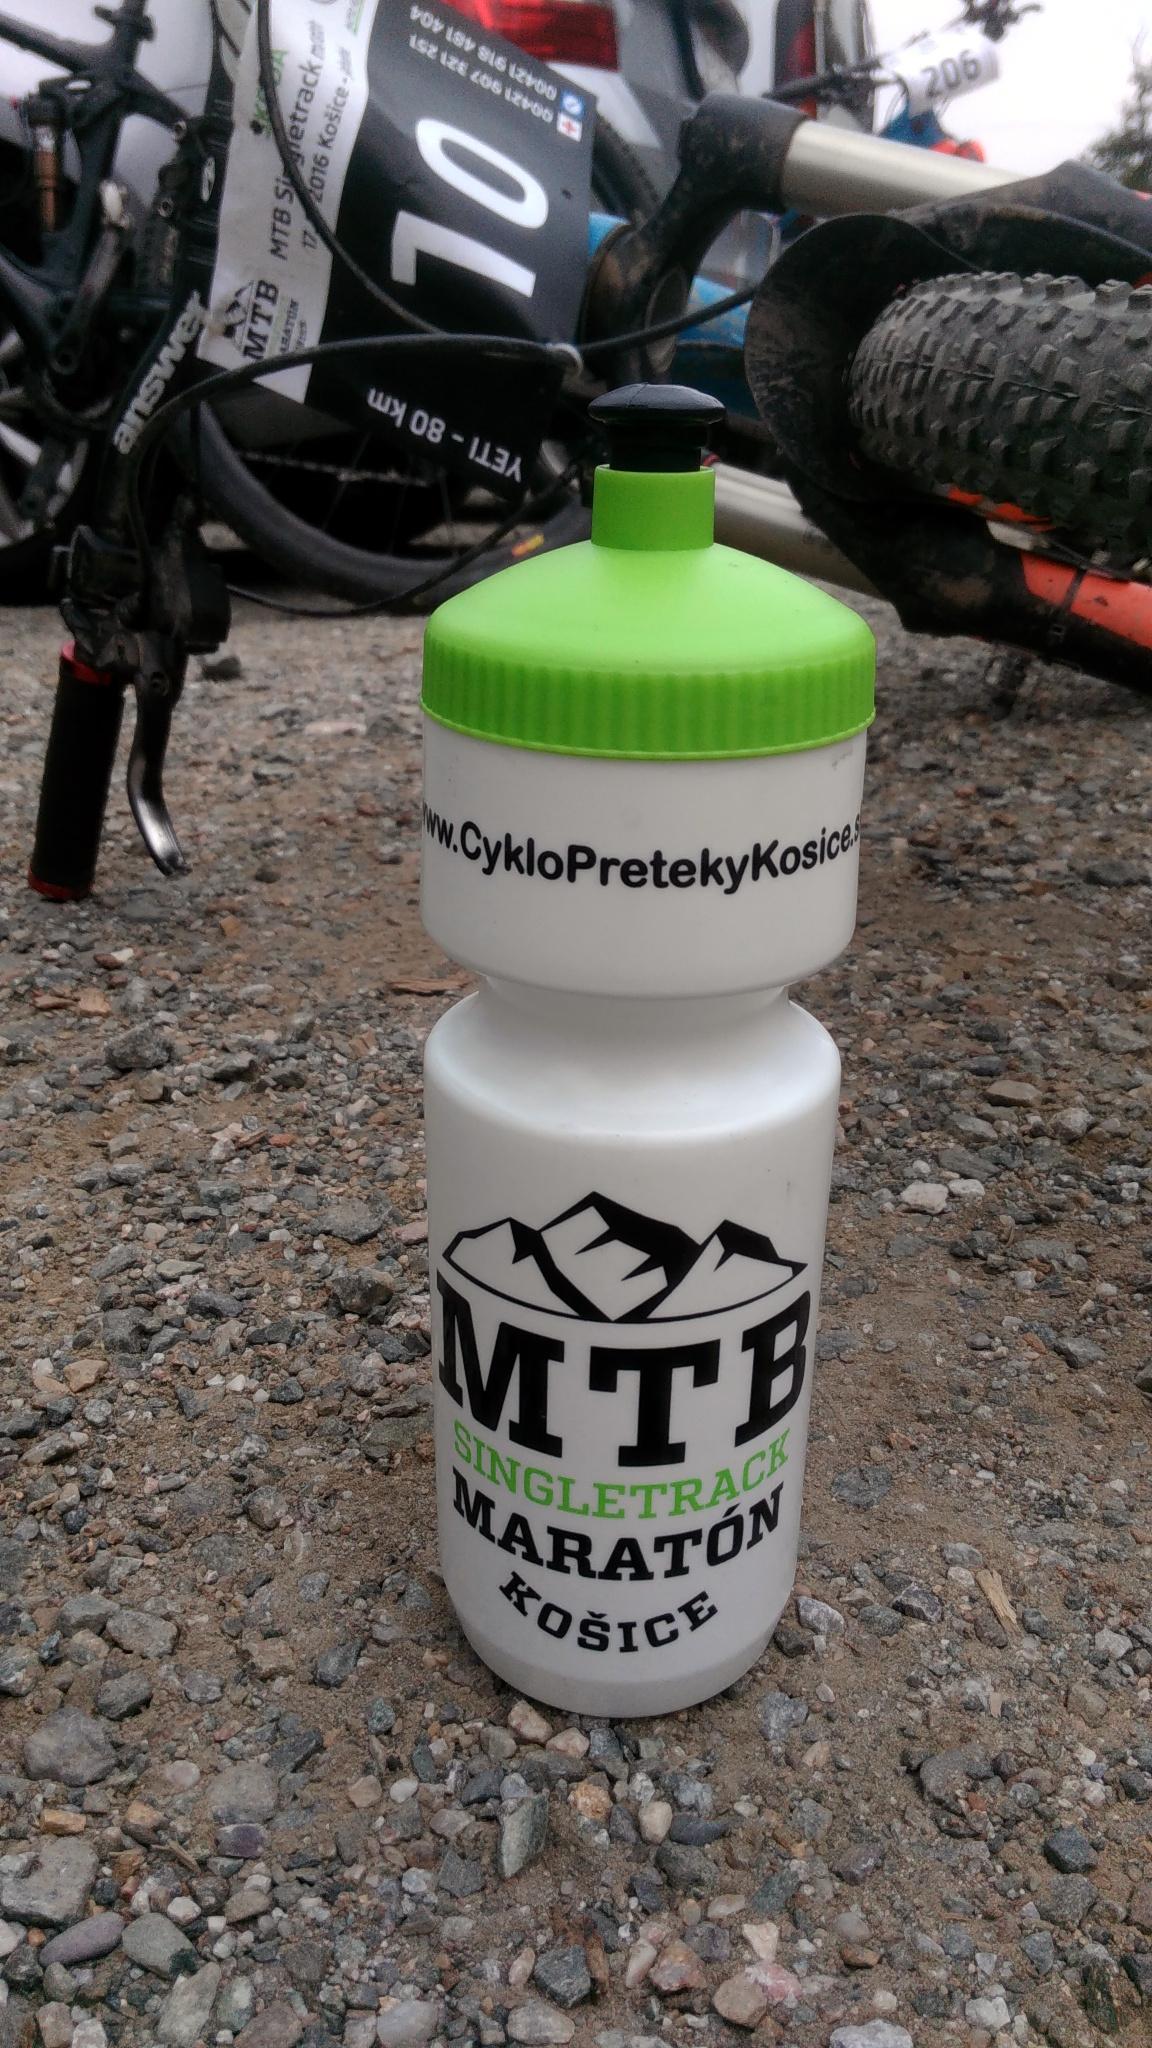 Kassa singletrack MTB maraton 2016 - kulacs